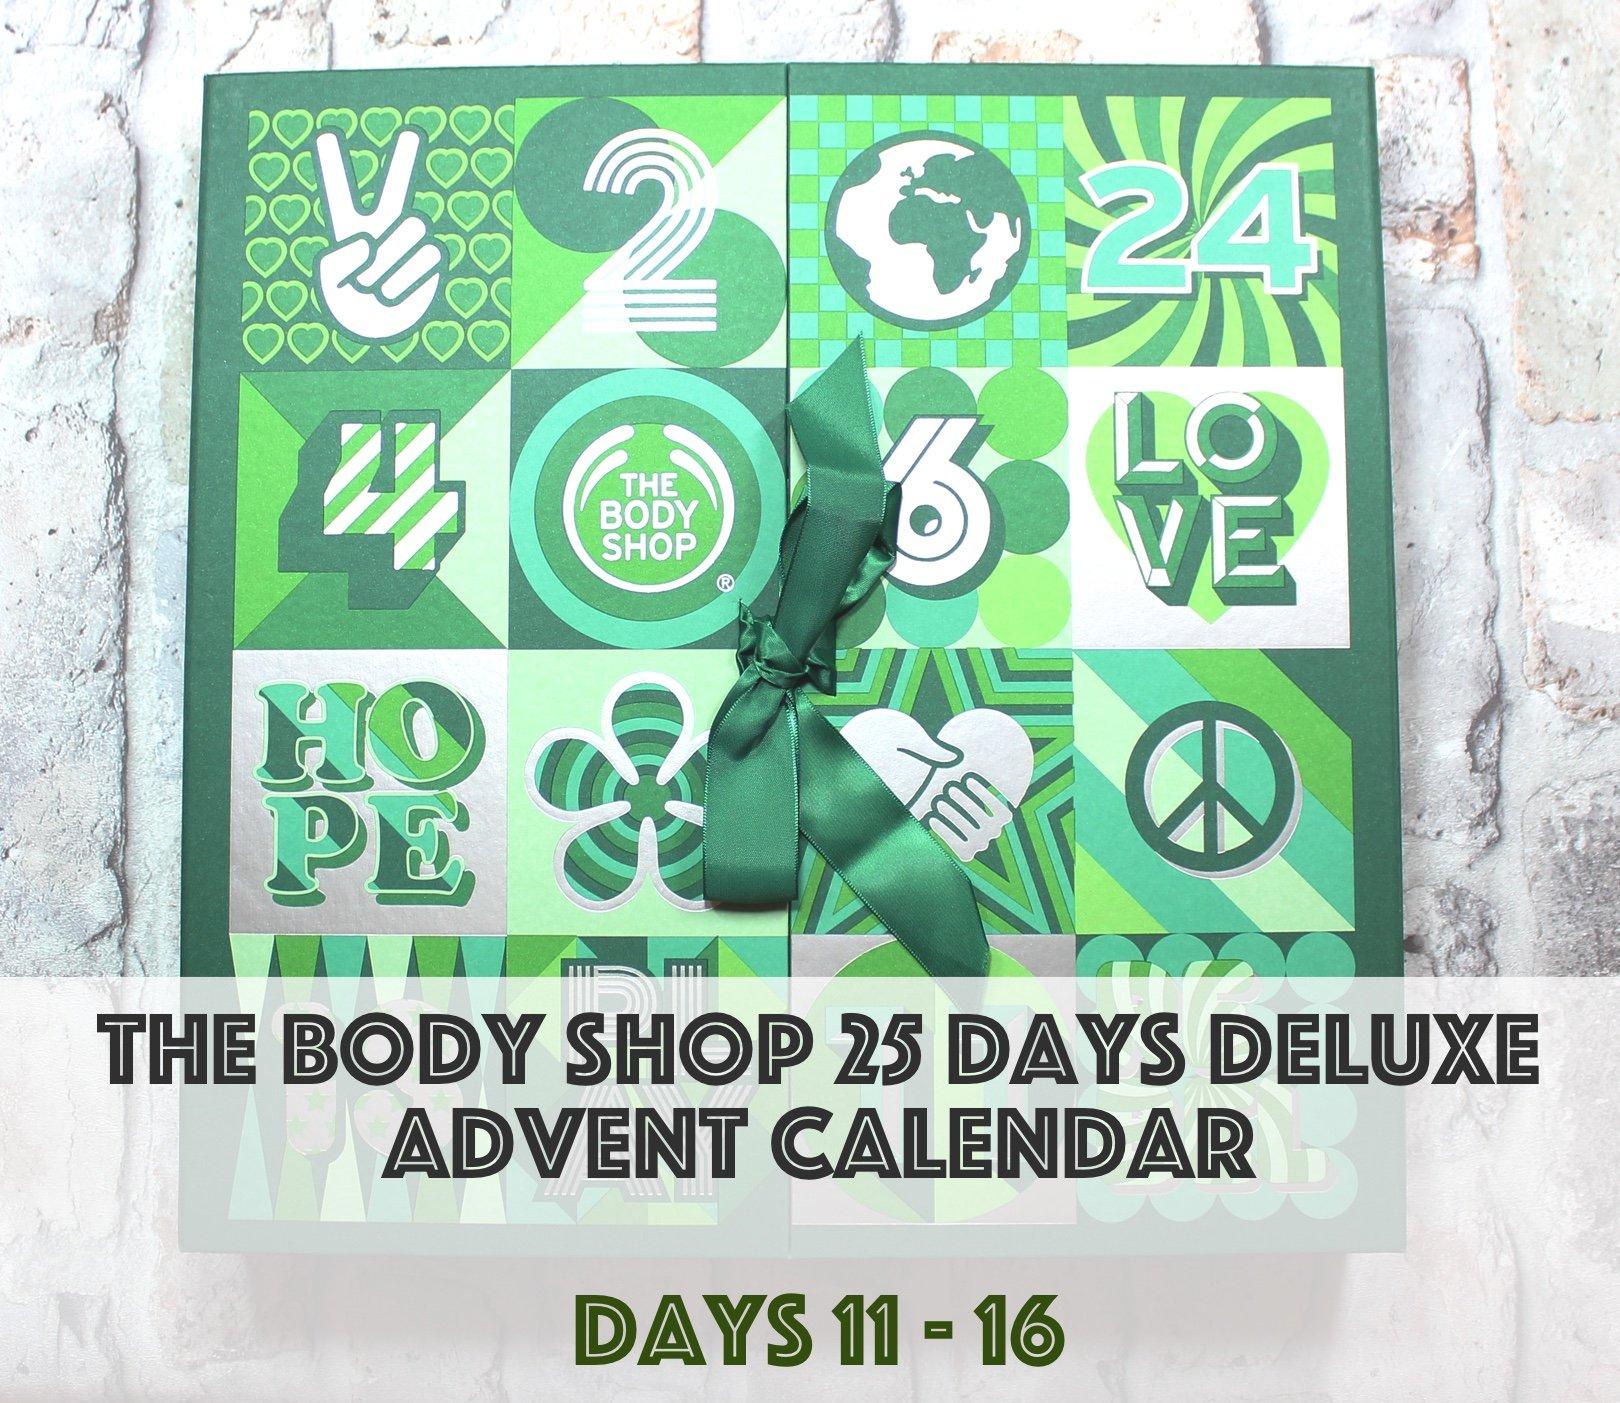 The Body Shop Deluxe Advent Calendar: Days 11-16